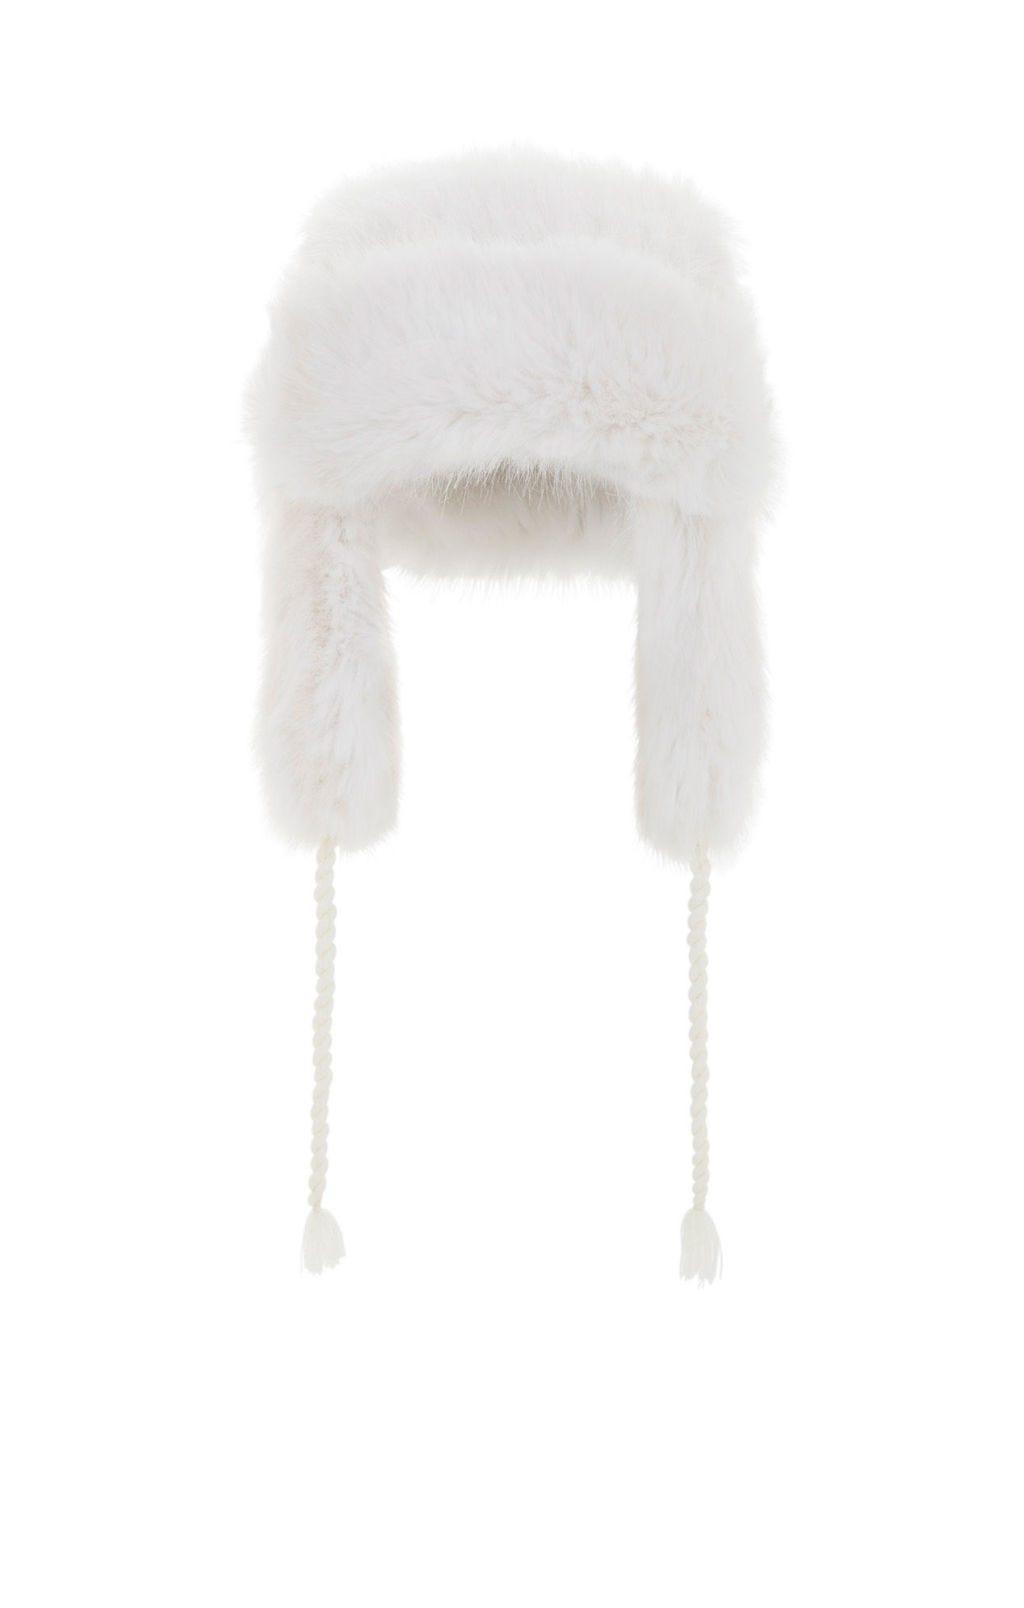 bcbb faux fur trapper hat in white